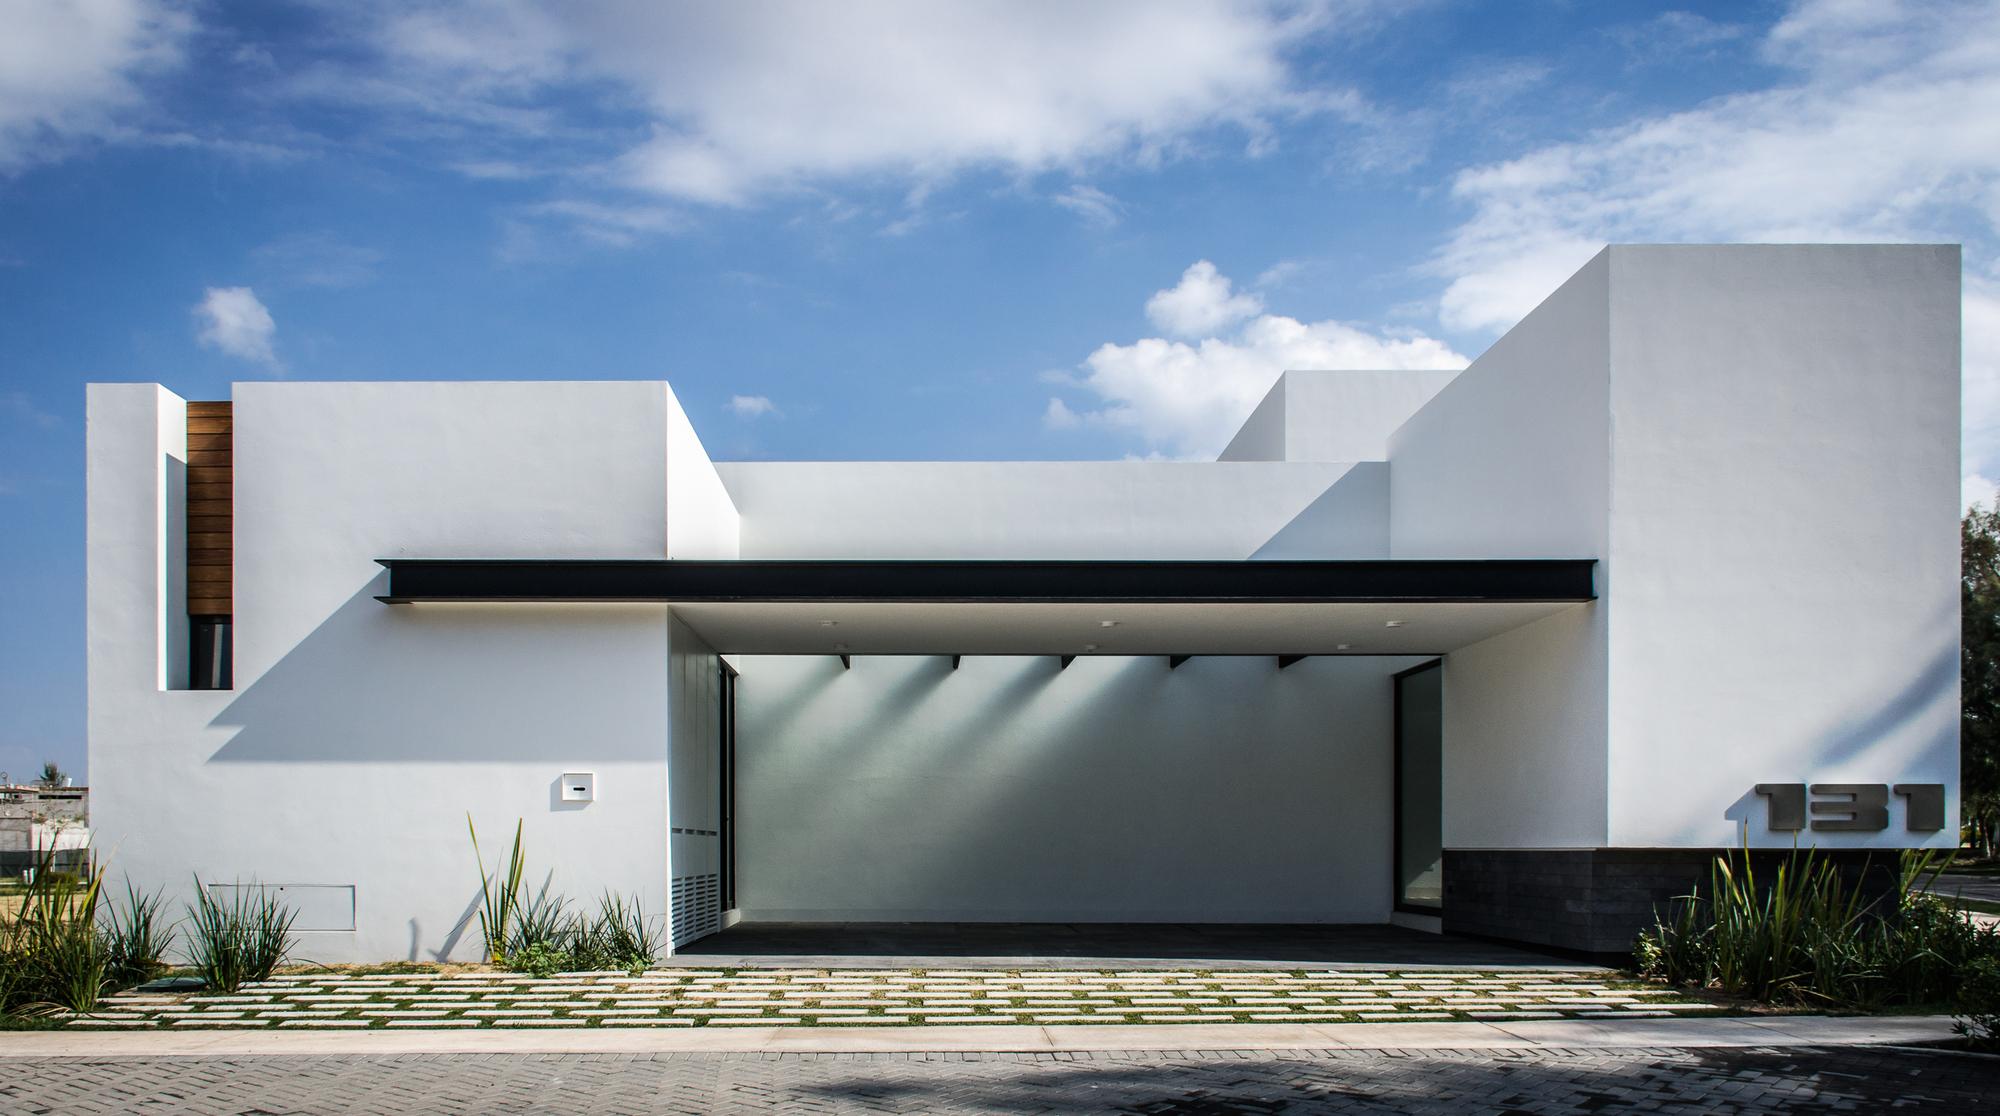 Galer a de casa agr adi arquitectura y dise o interior 2 for Arquitectura y diseno interior